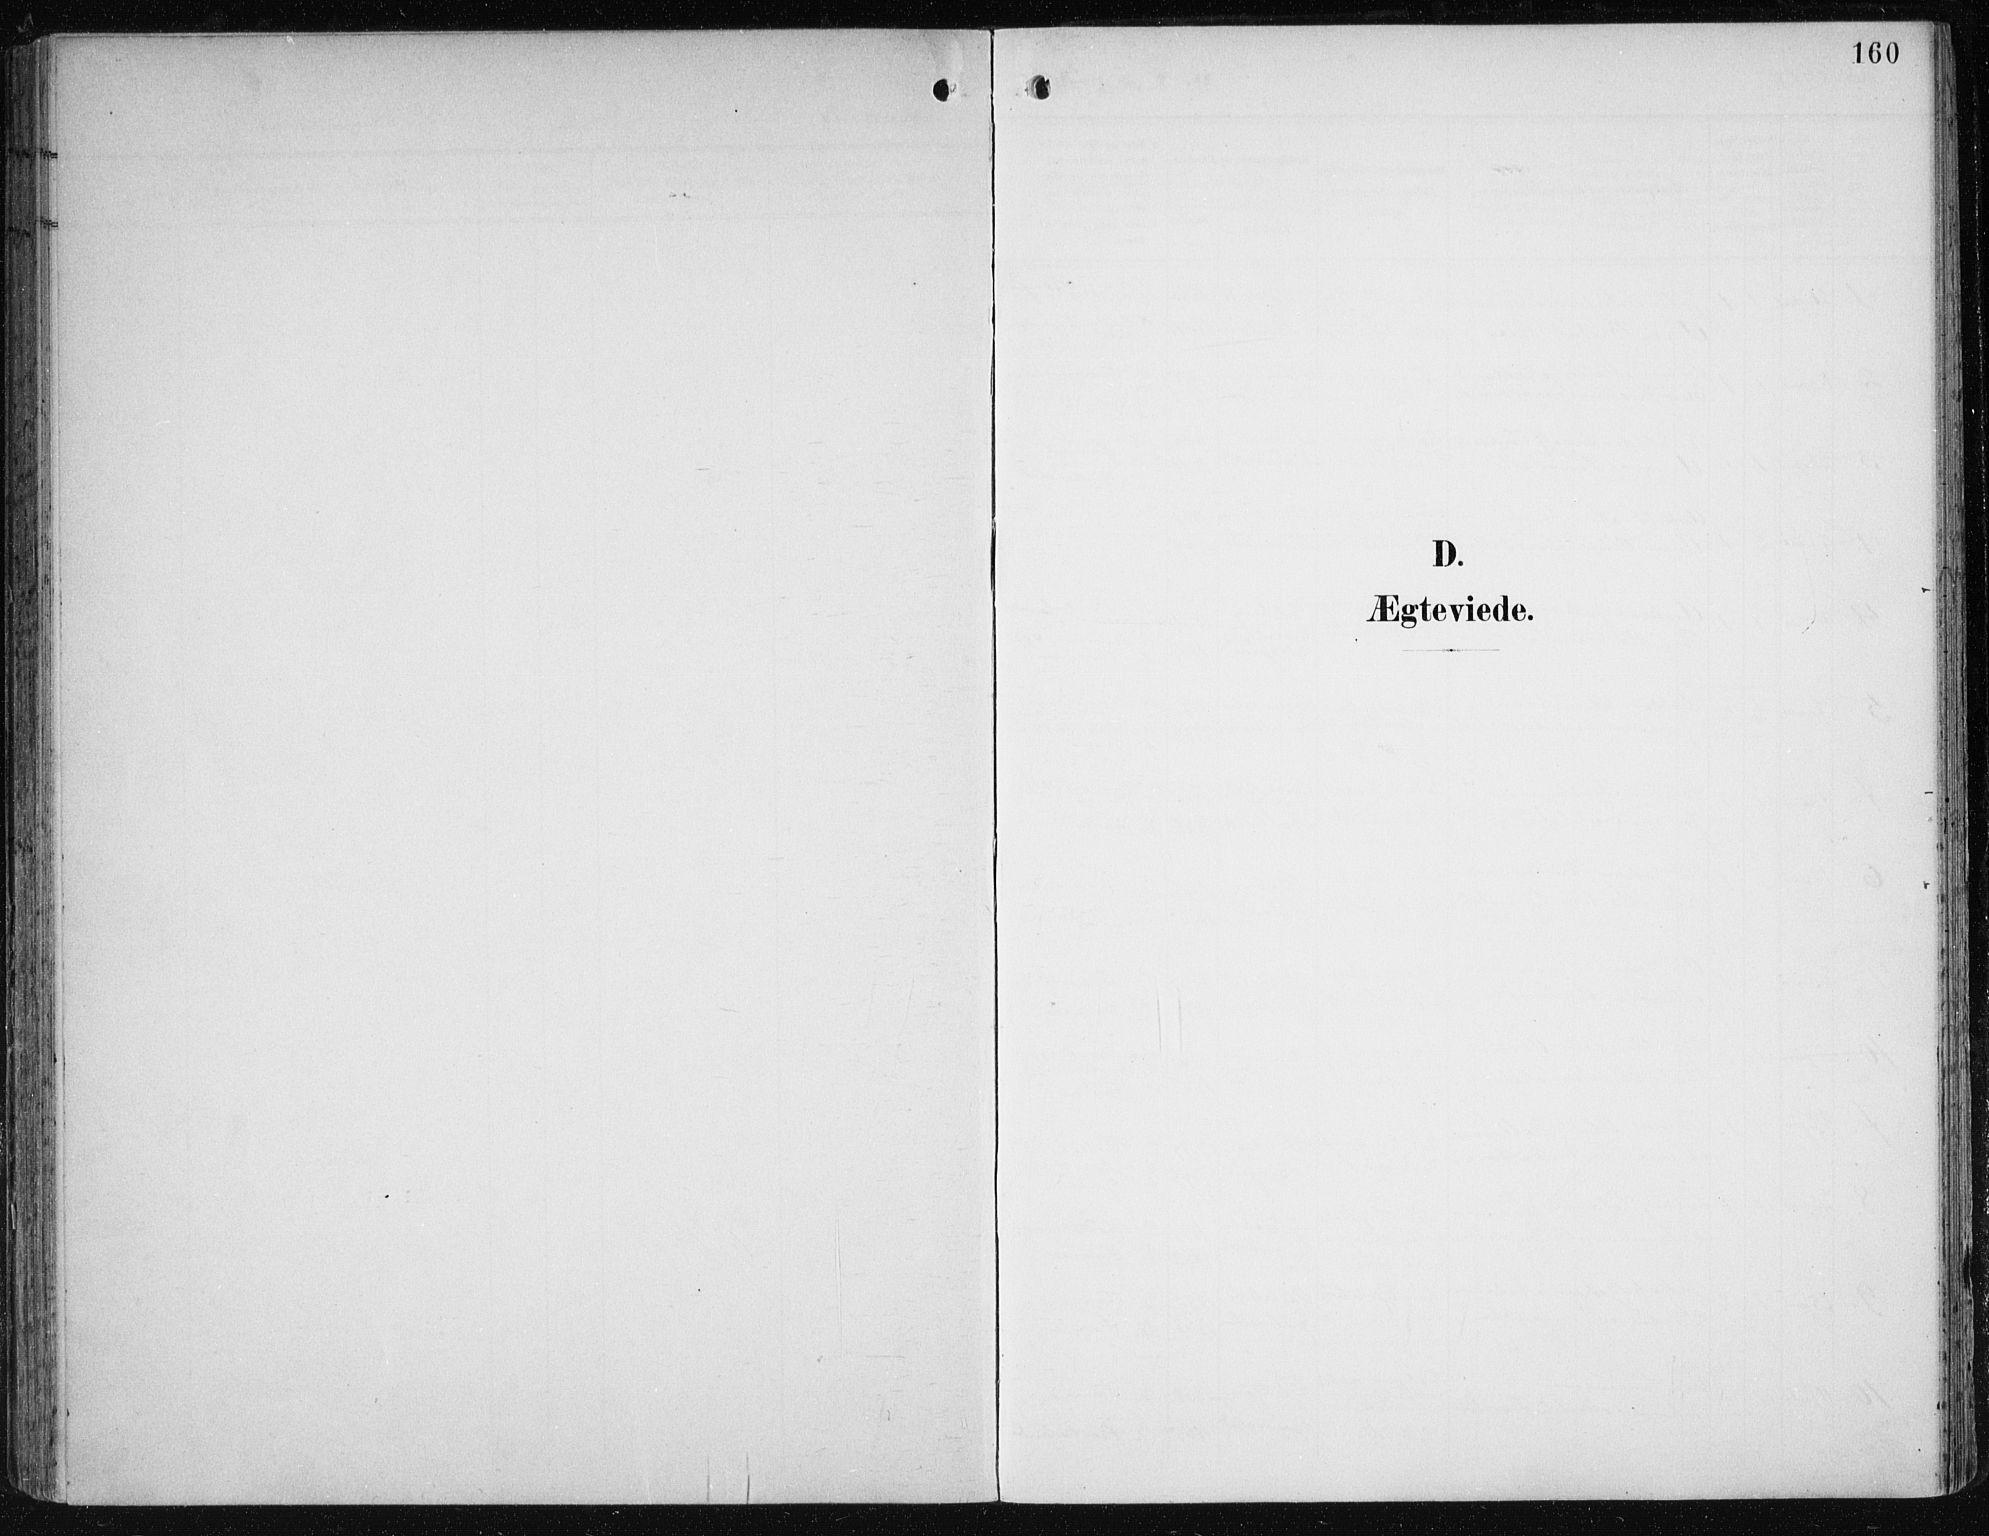 SAB, Fana Sokneprestembete, H/Haa/Haai/L0003: Ministerialbok nr. I 3, 1900-1912, s. 160